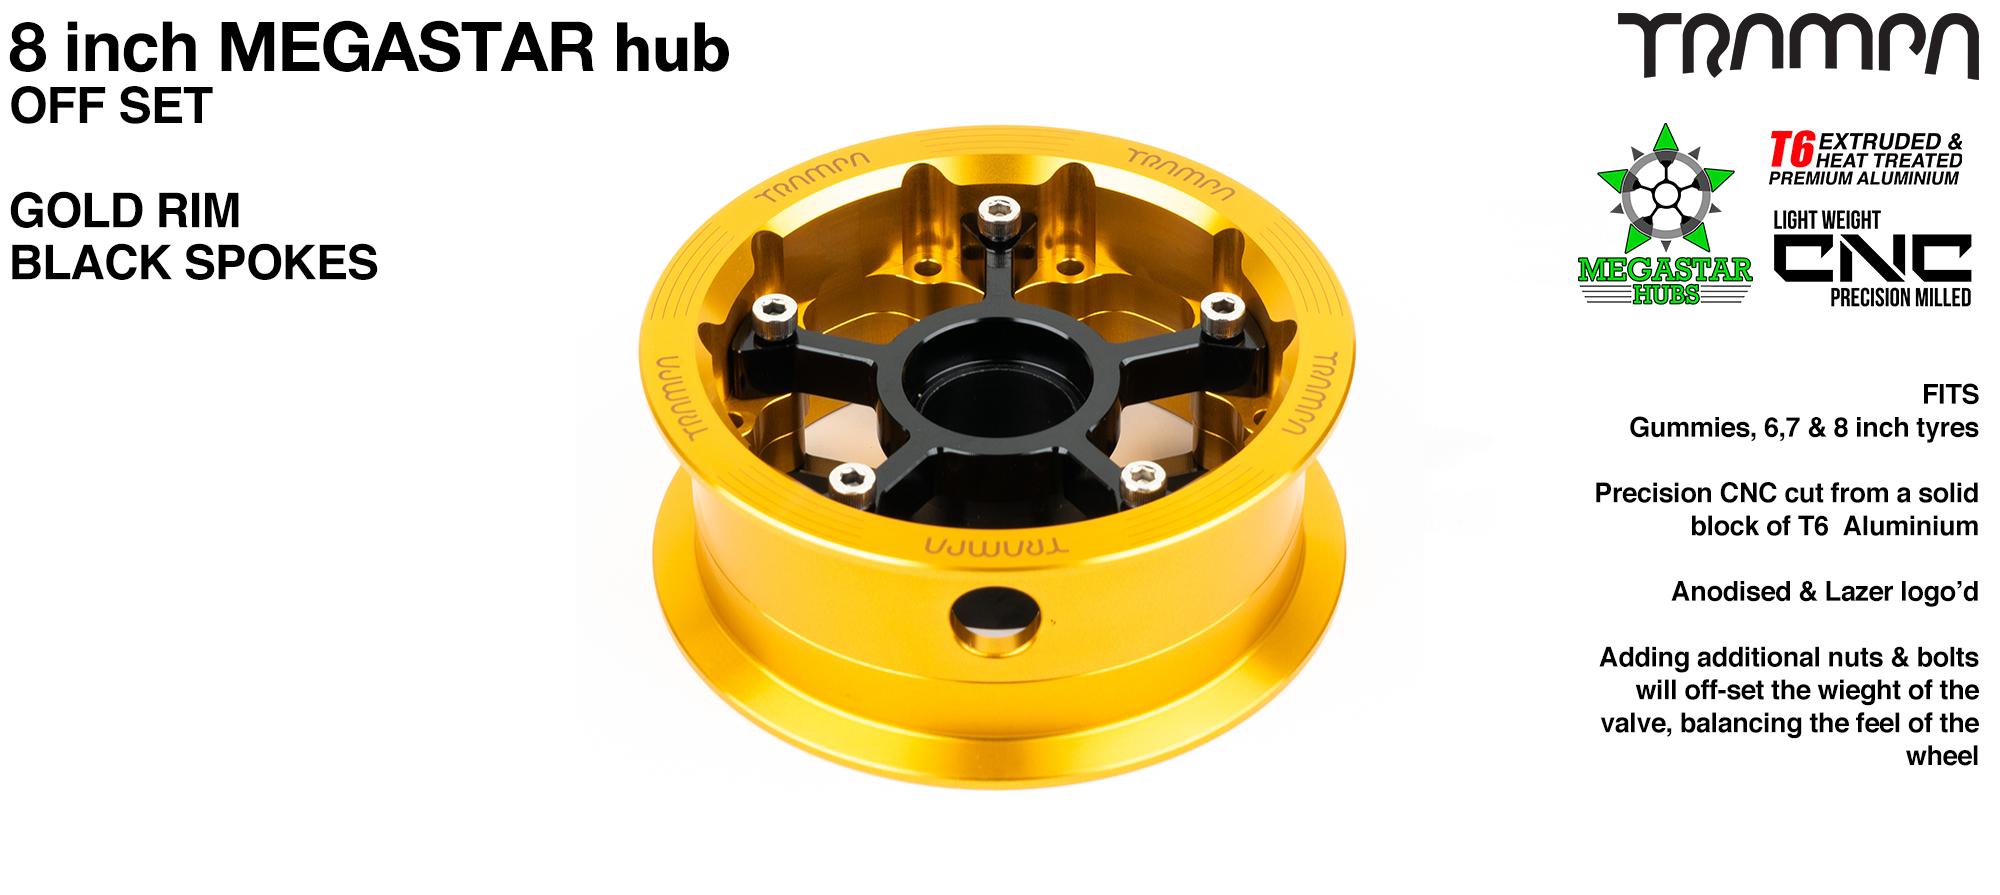 8 Inch OFF-SET MEGASTAR Hub - GOLD Rim with BLACK Spokes